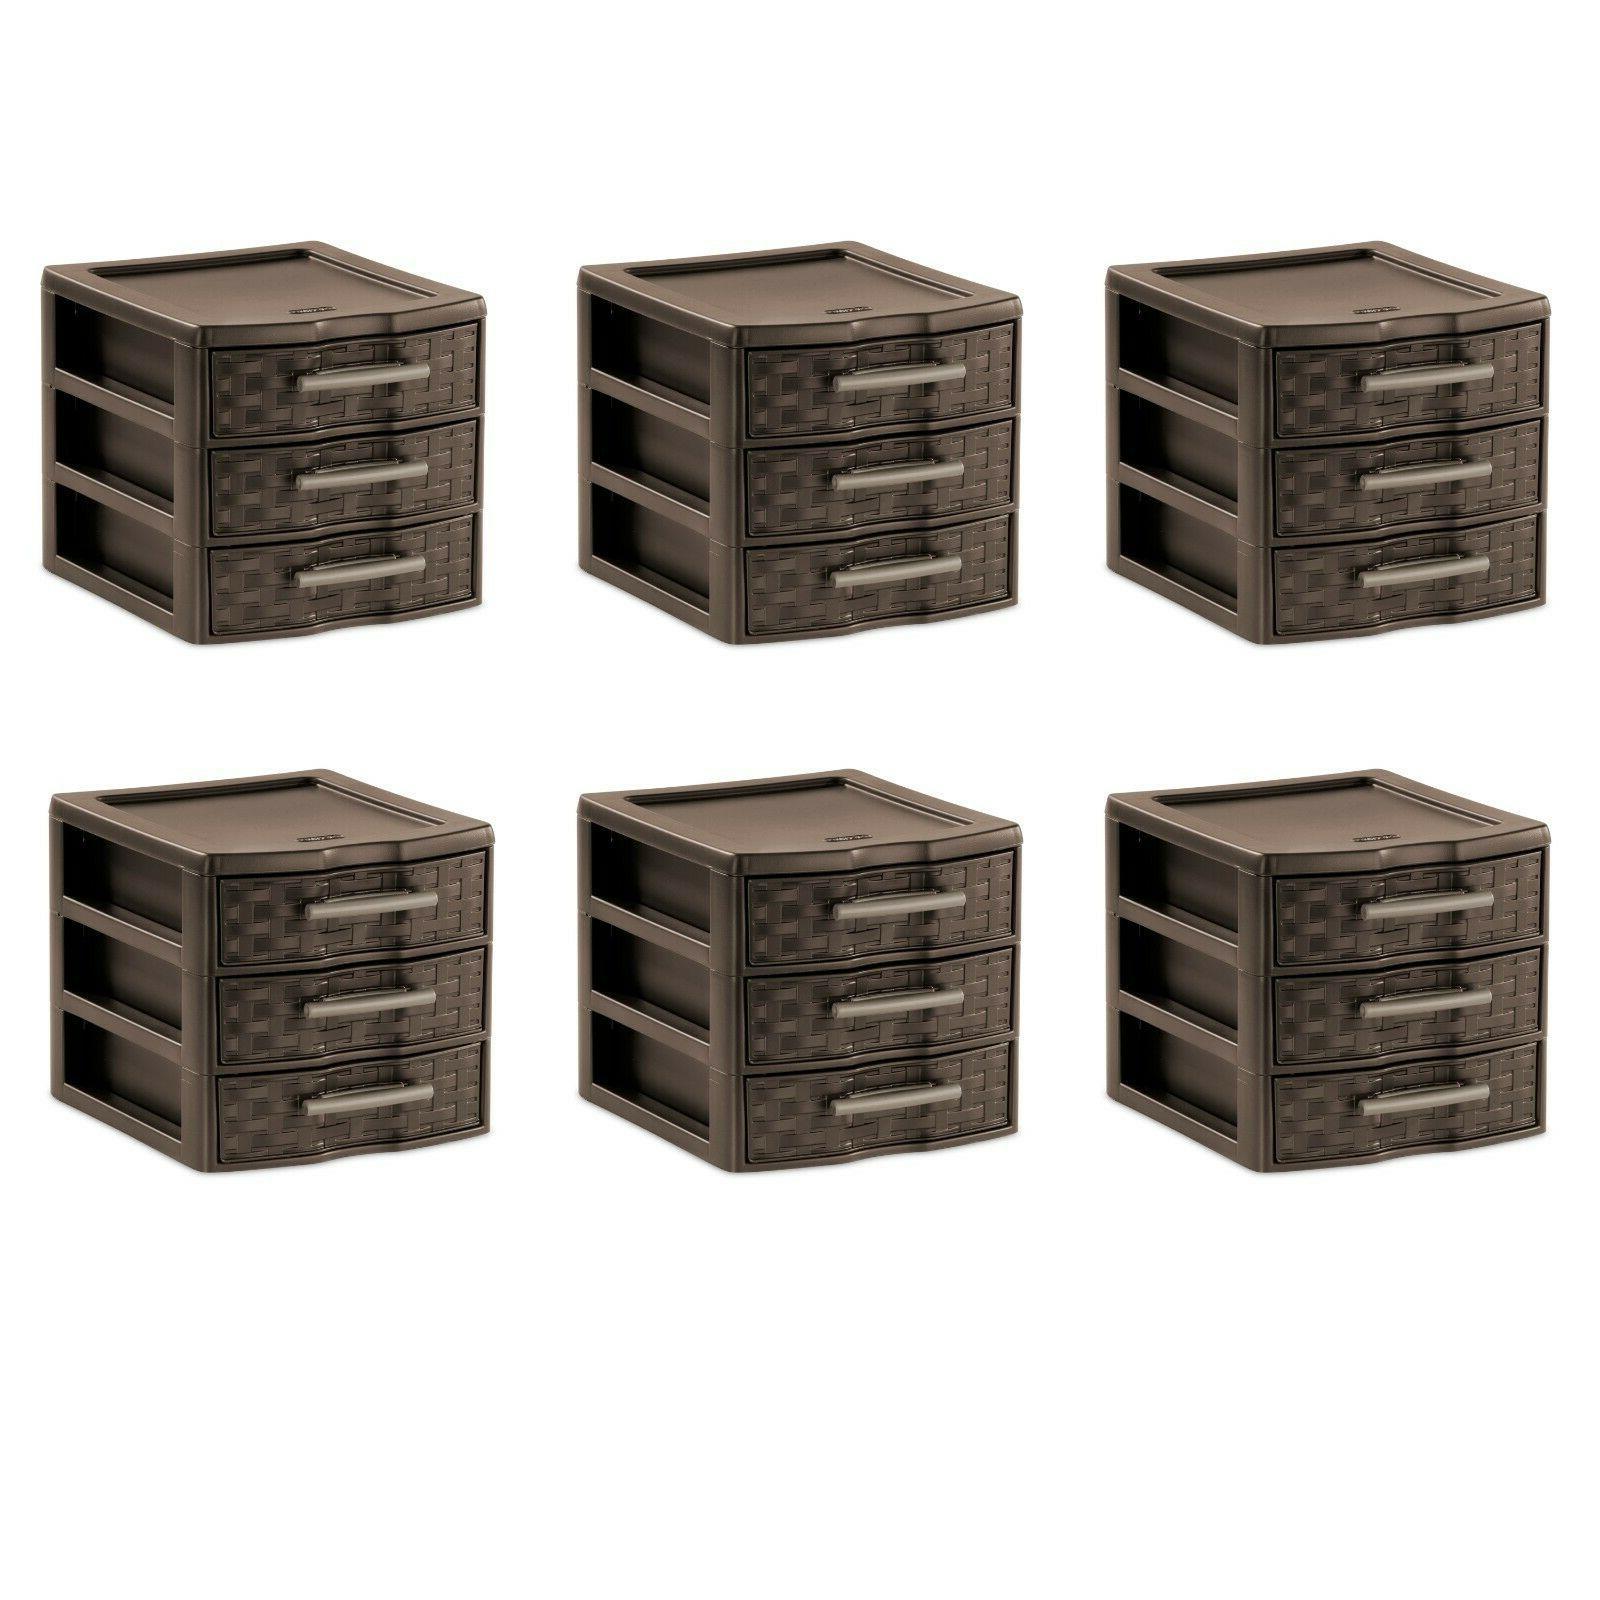 Plastic Storage Drawer Set Sterilite Cabinet Large Organizer Container